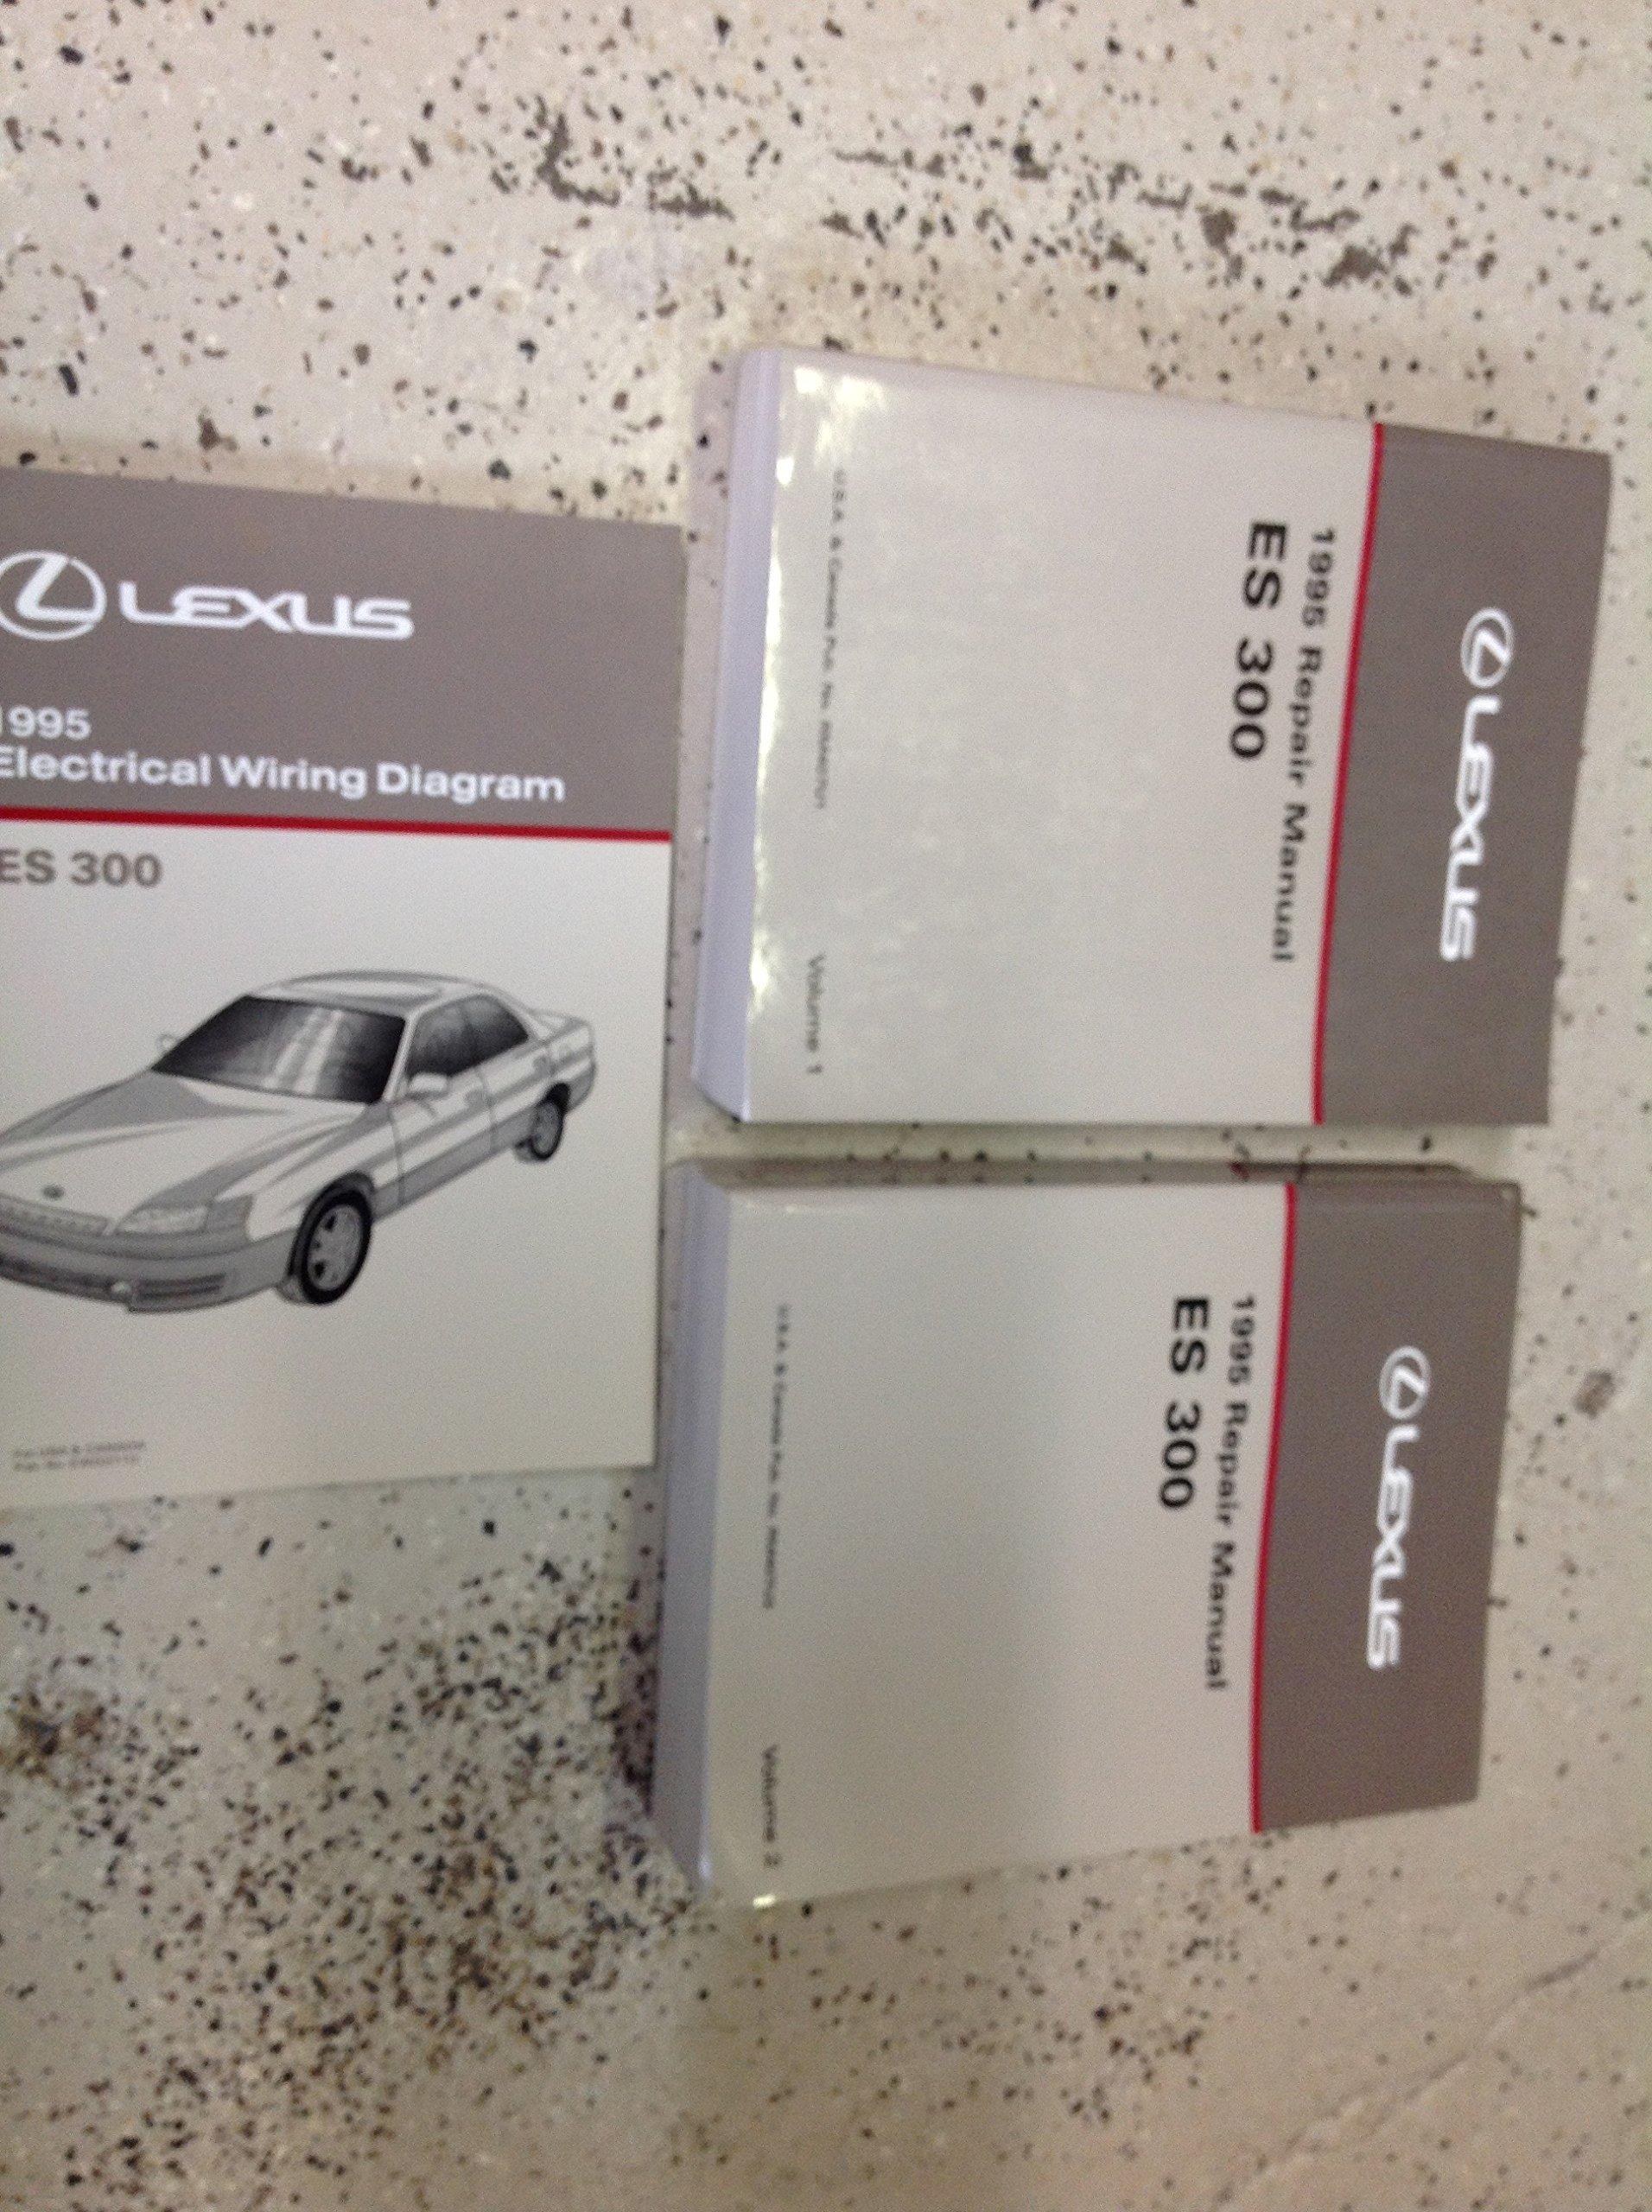 1995 lexus es300 es 300 service shop repair manual set w  lexus e300 1995 wiring diagram #12